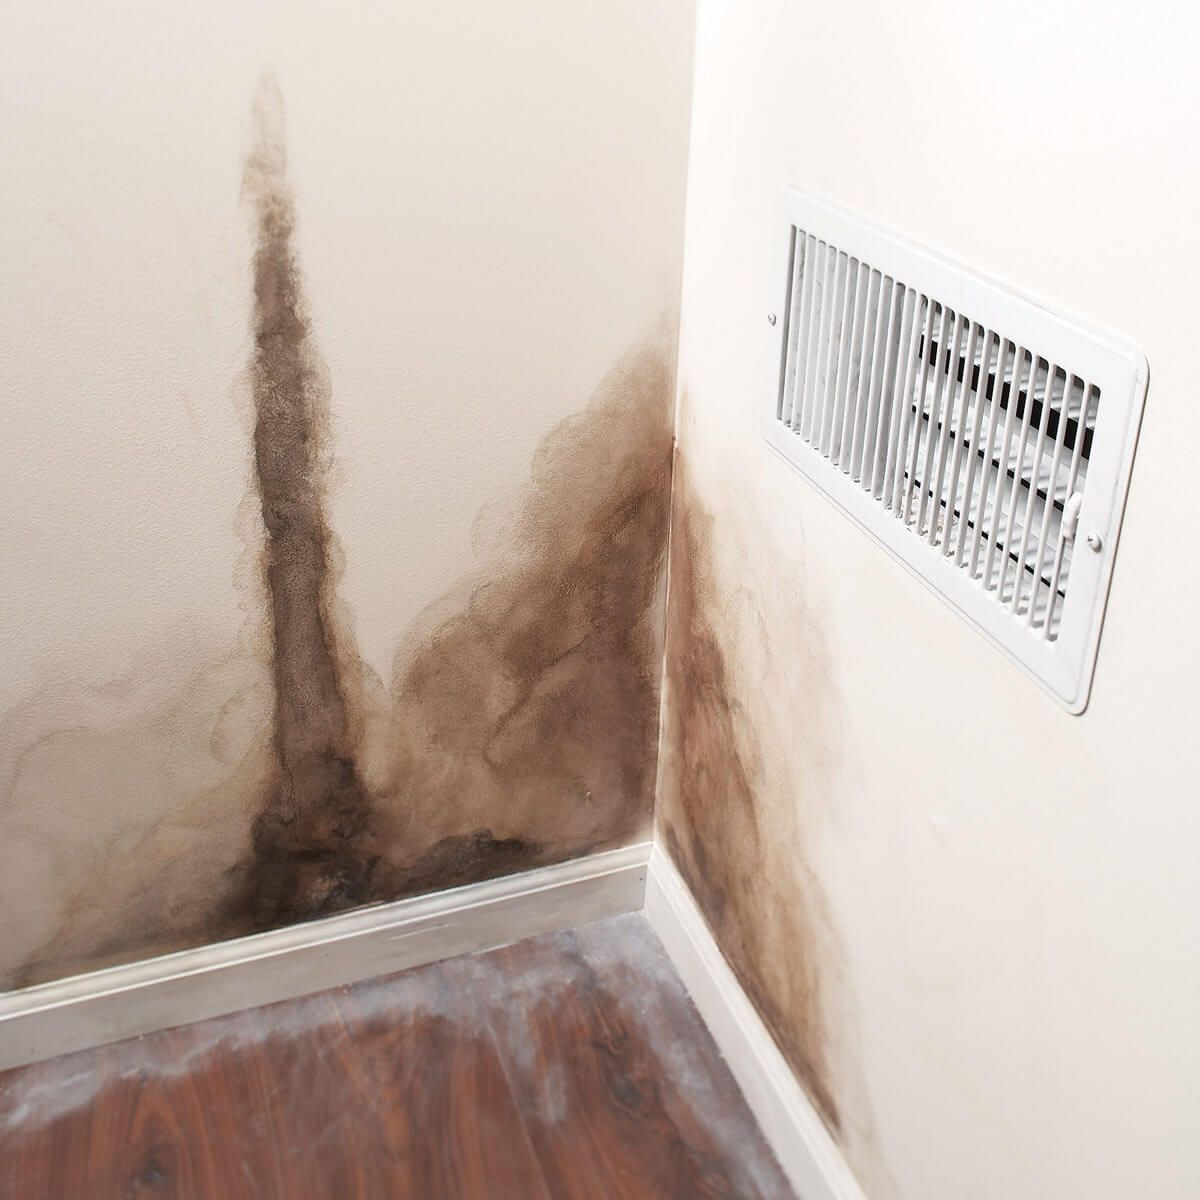 How to Prevent Bathroom Mold | Mold in bathroom, Mildew ...